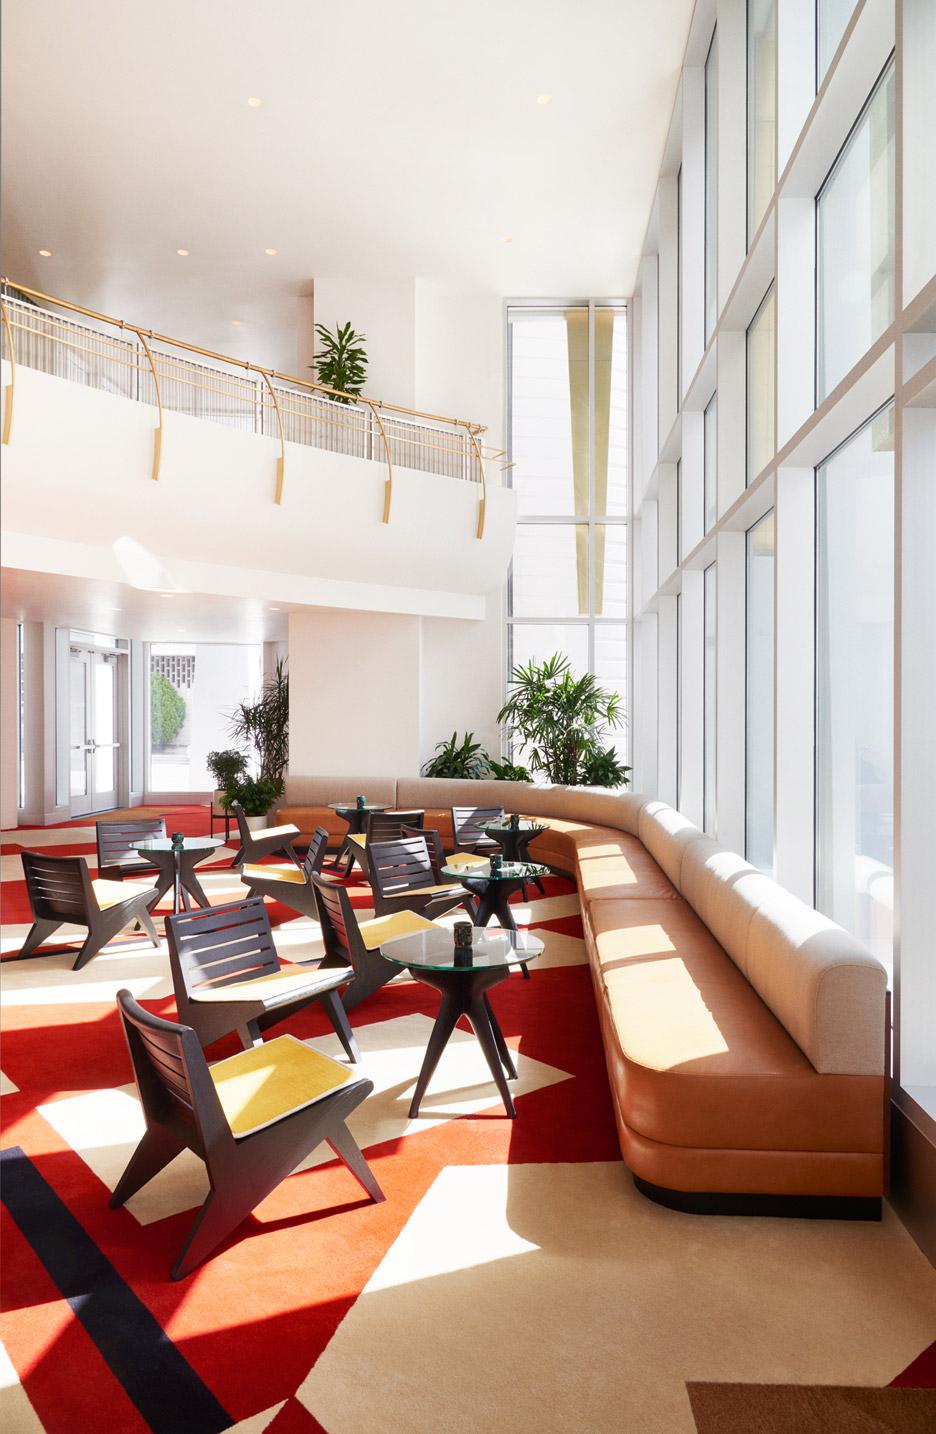 The Durham North Carolina hotel by Commune